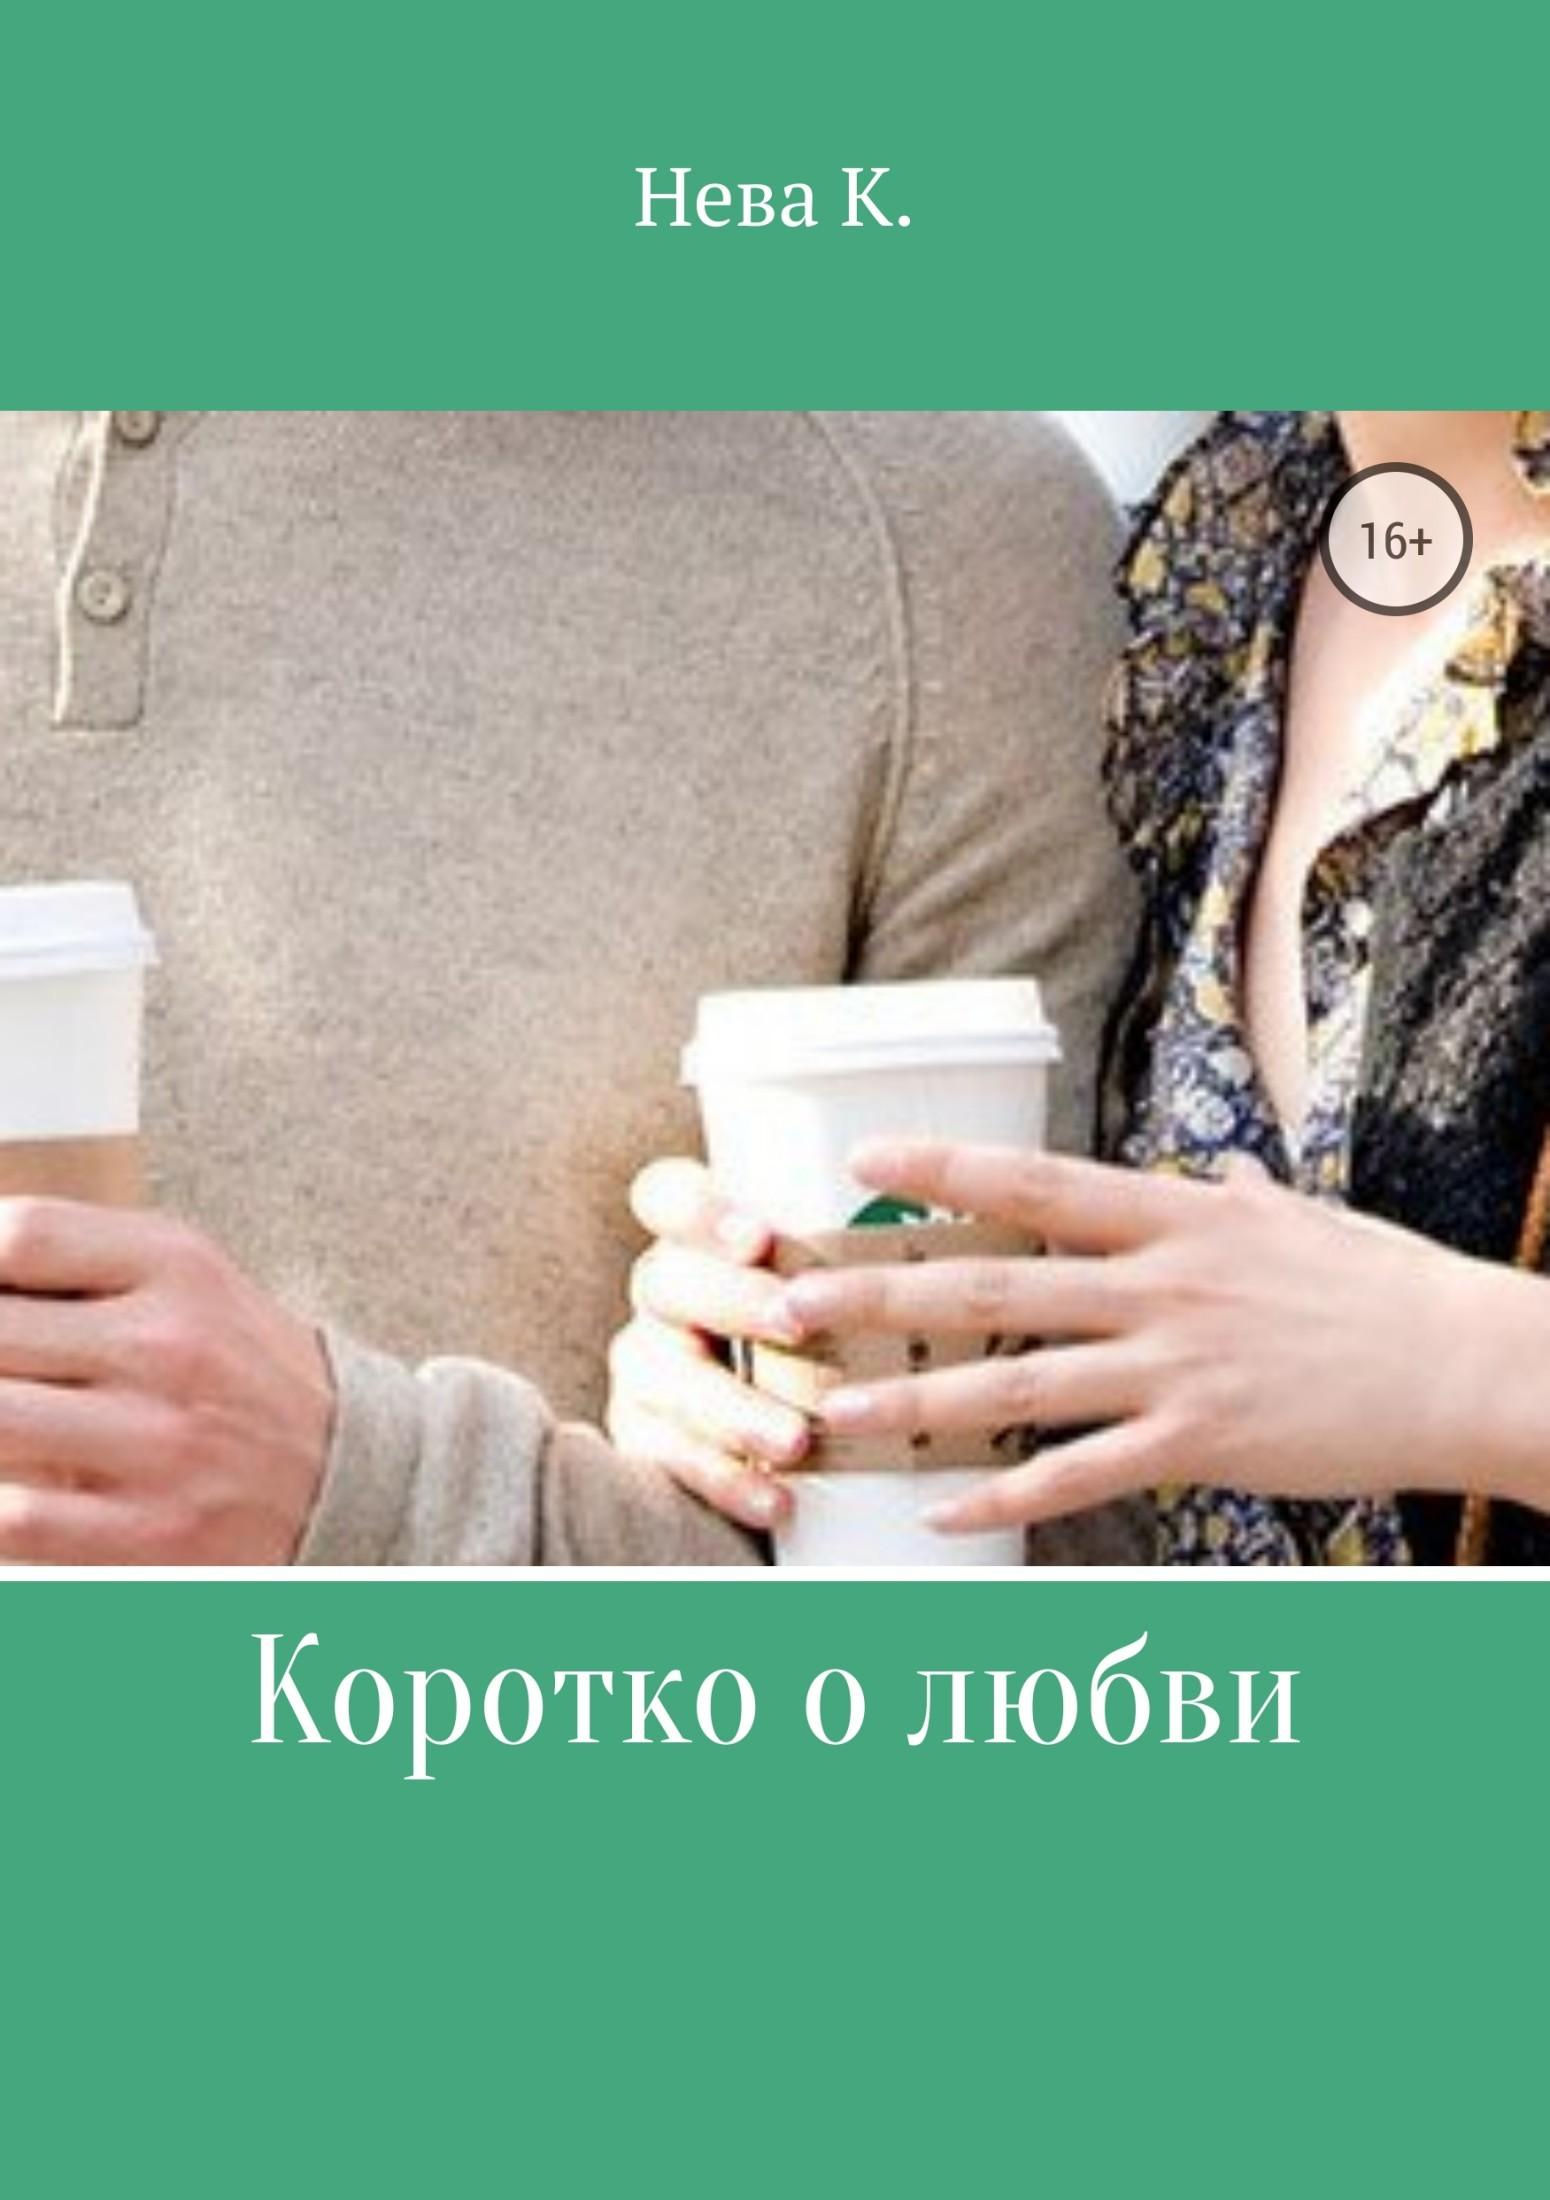 Катя Нева Коротко о любви